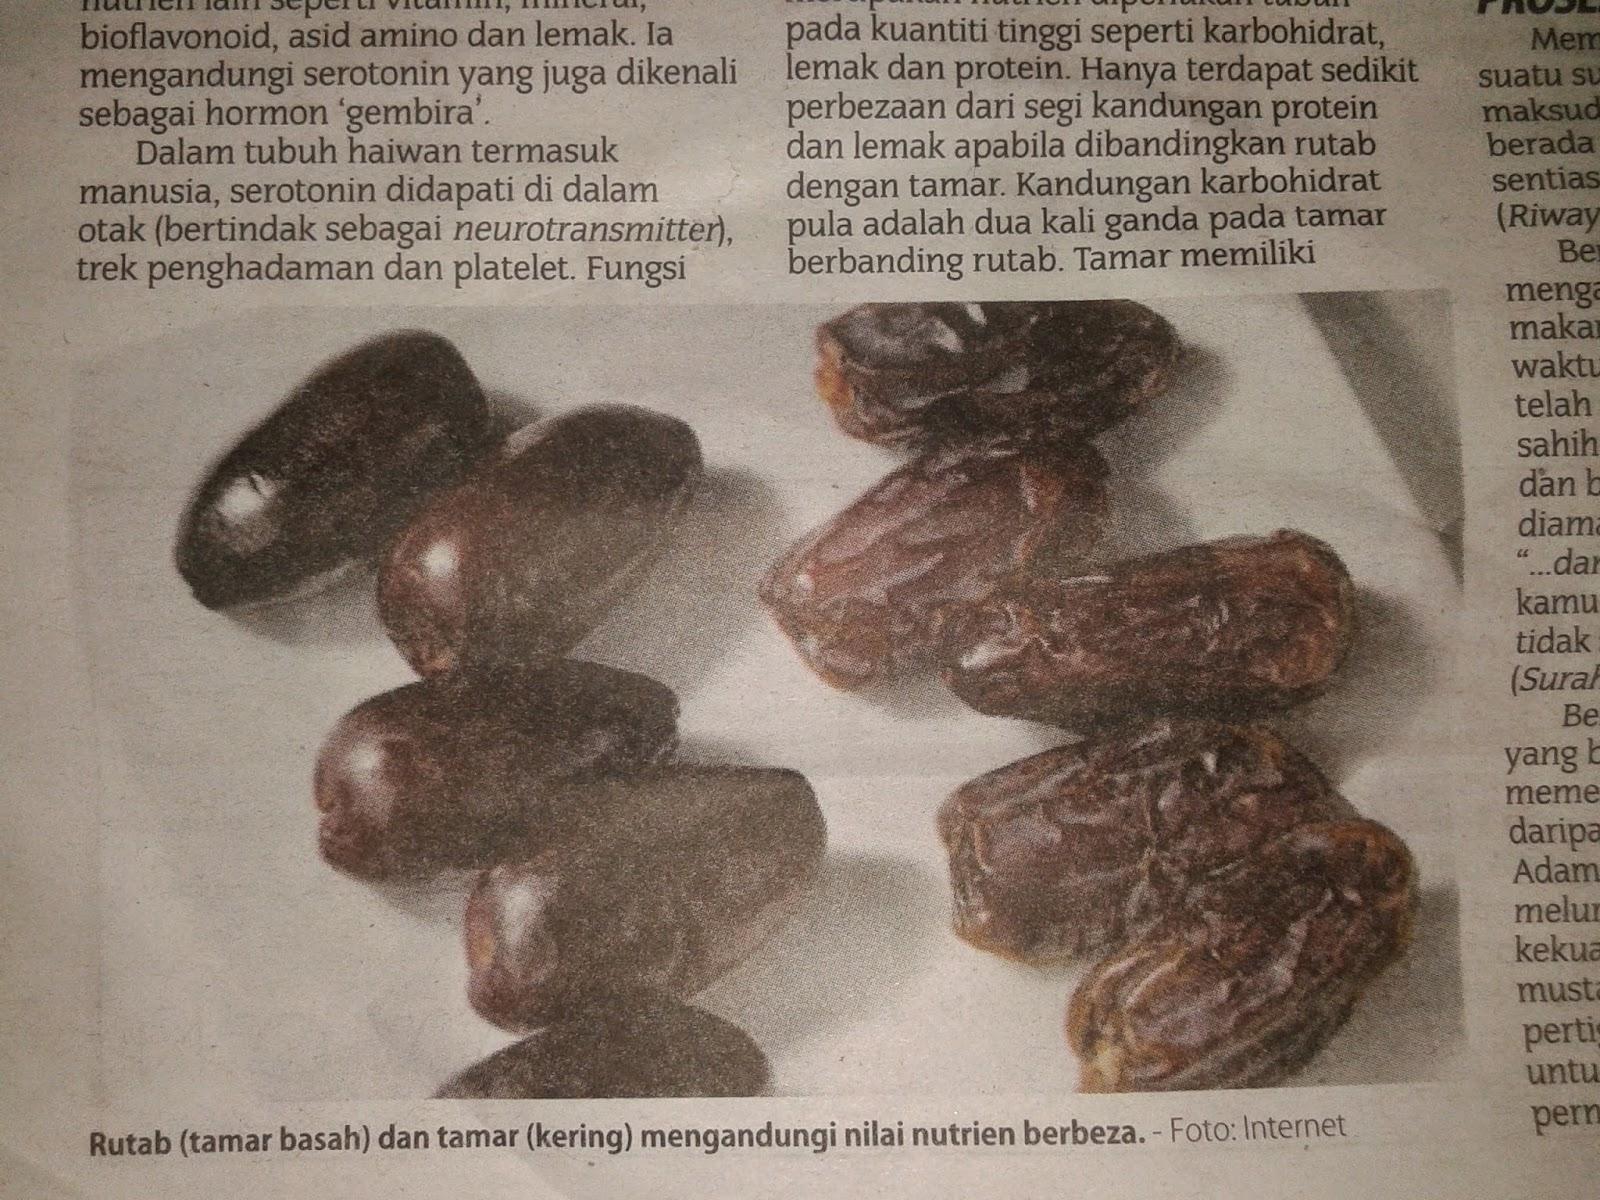 kurma, rutab, vitamin C